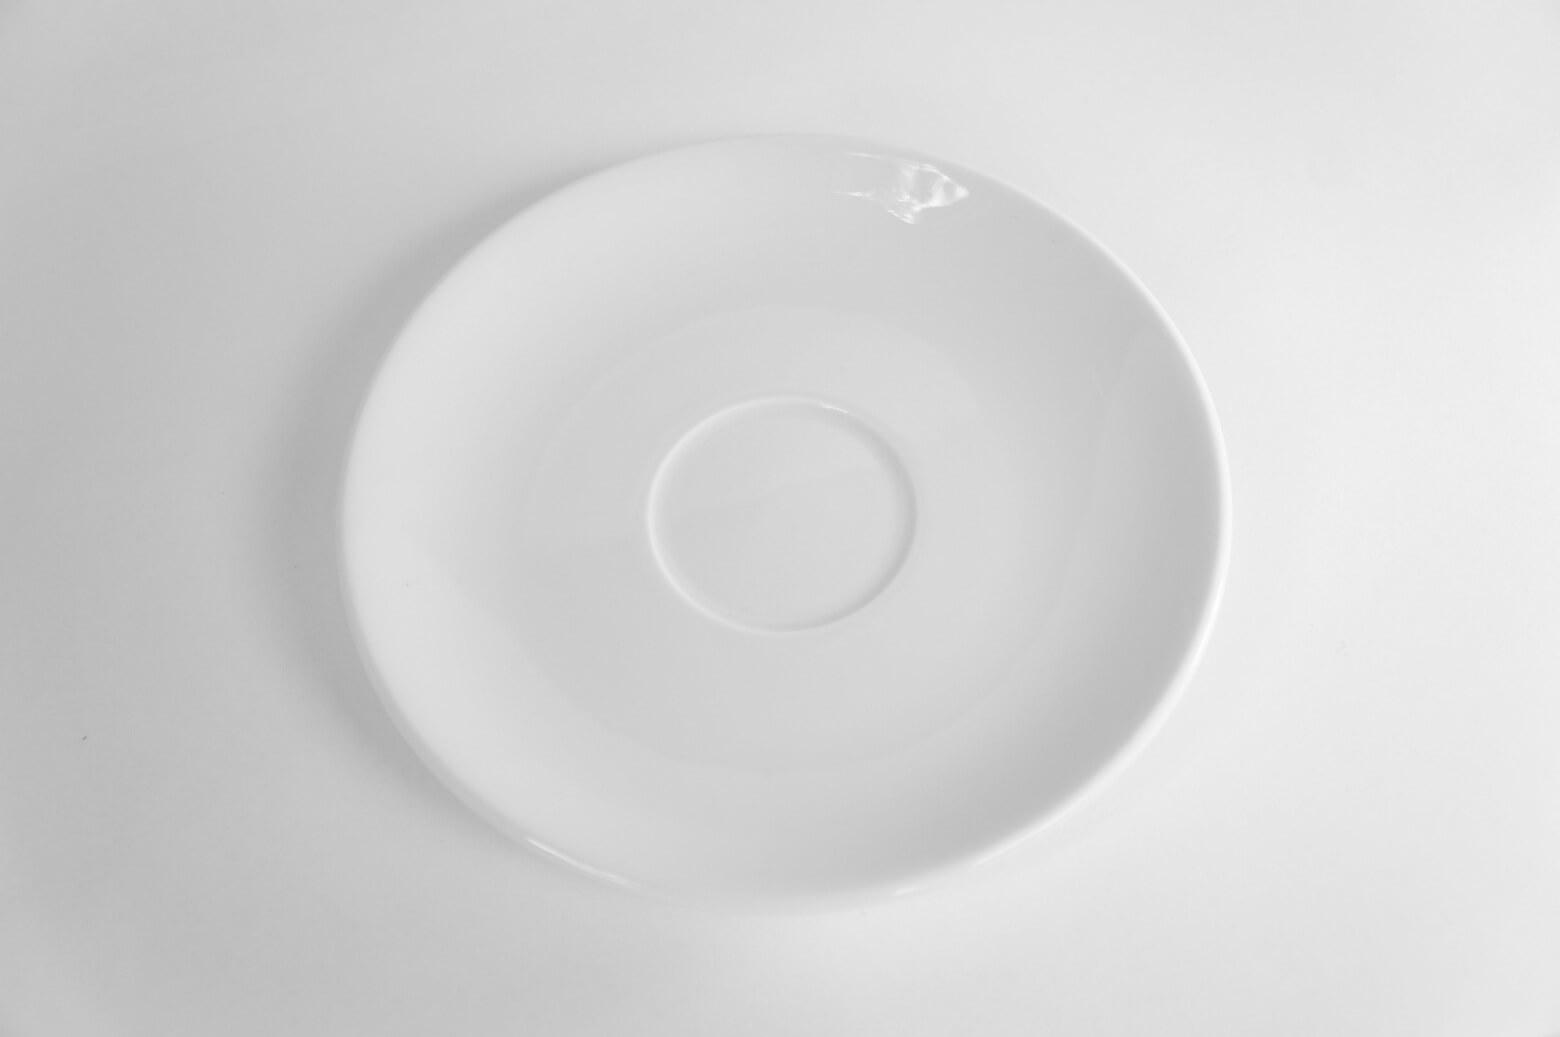 Royal Copenhagen WHITE POT Series/ロイヤル コペンハーゲン ホワイト ポット シリーズ カップ&ソーサー 北欧 食器 9